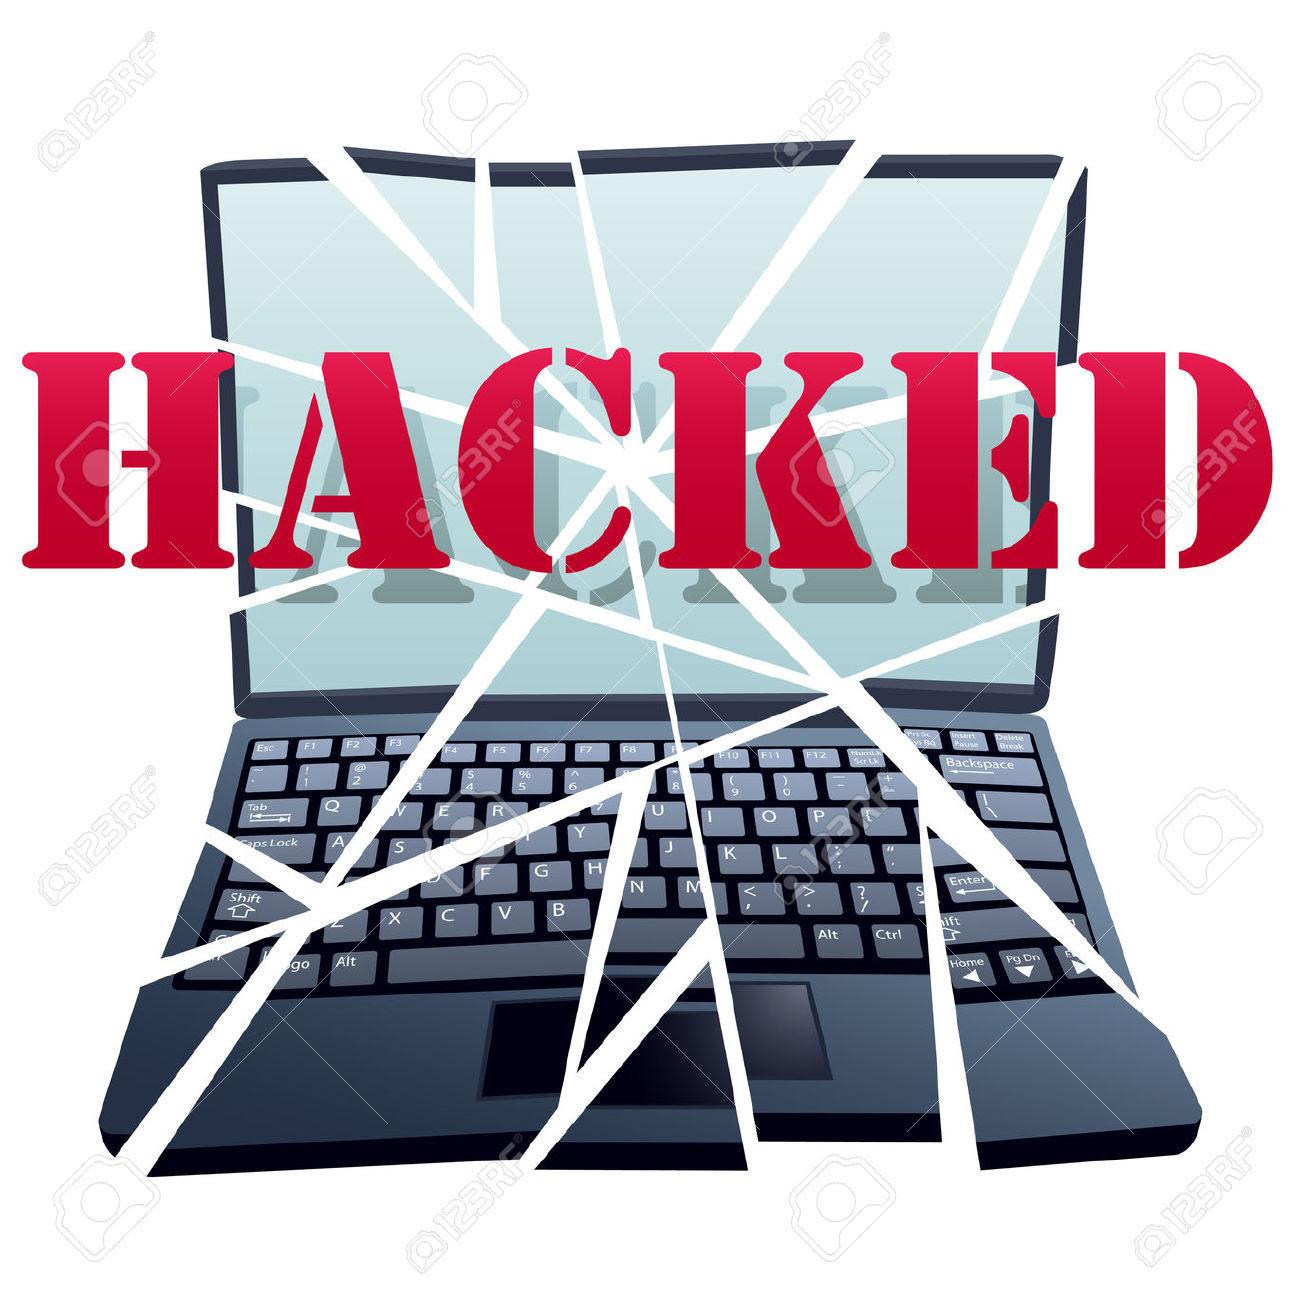 Hacked clipart - Cli